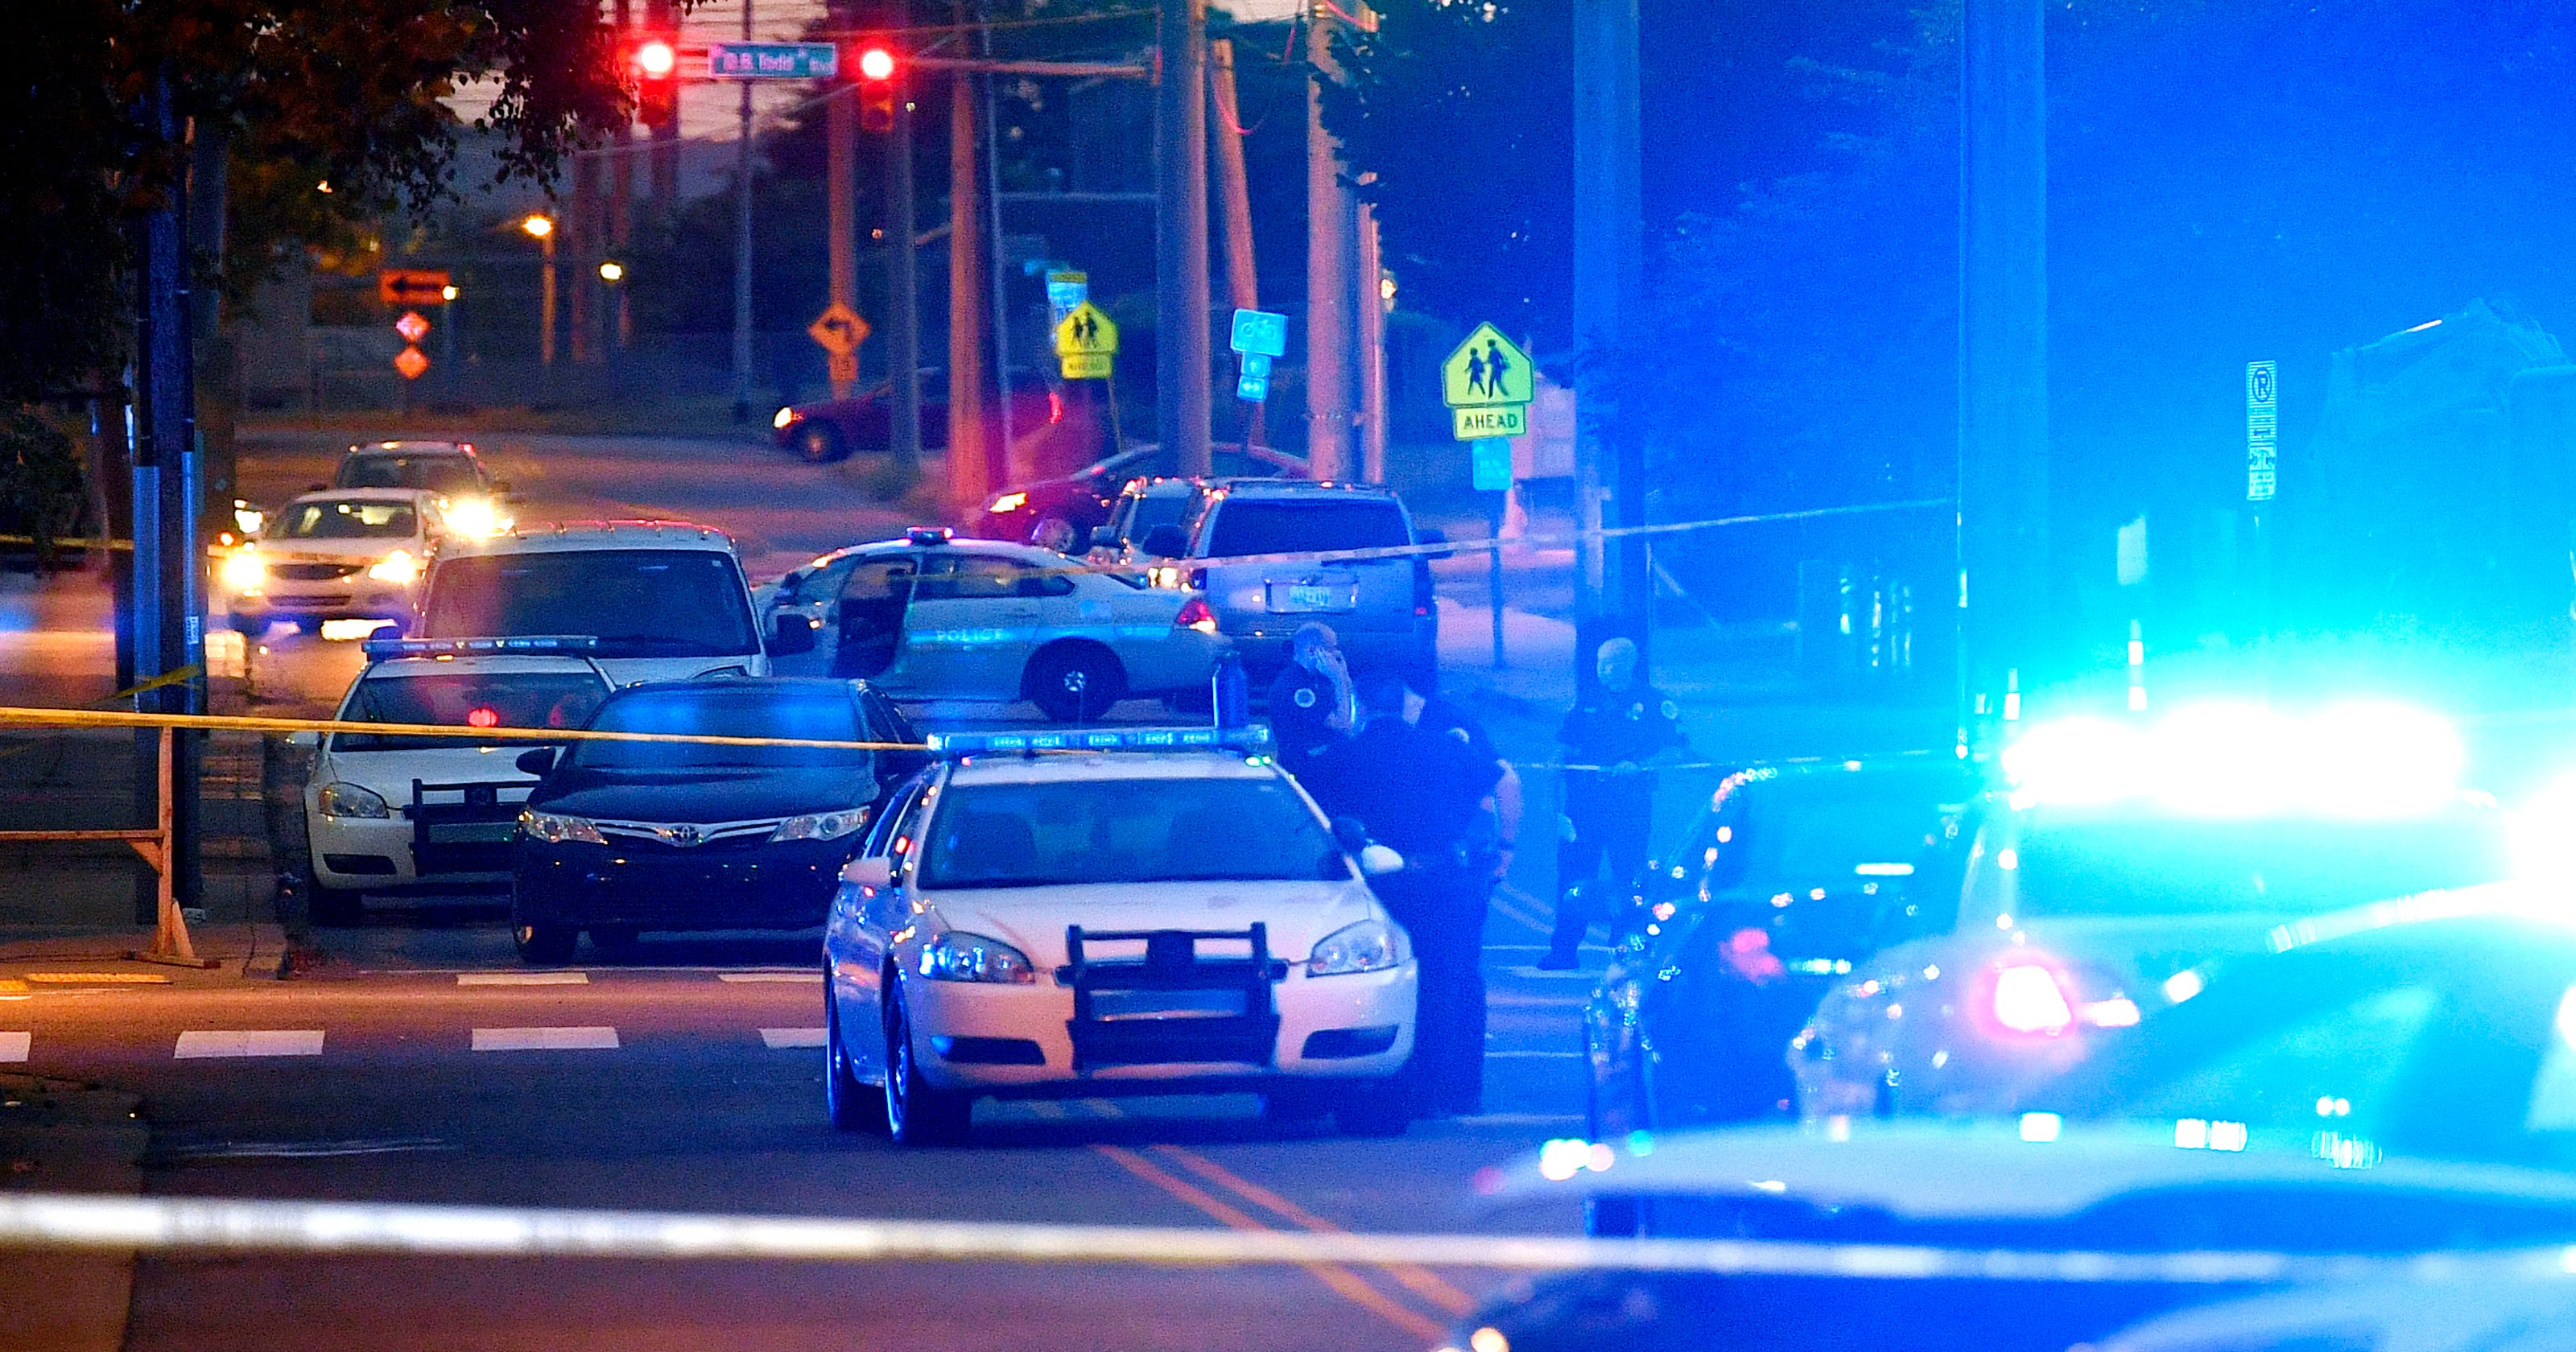 Nashville police Daniel Hambrick shooting: What we know